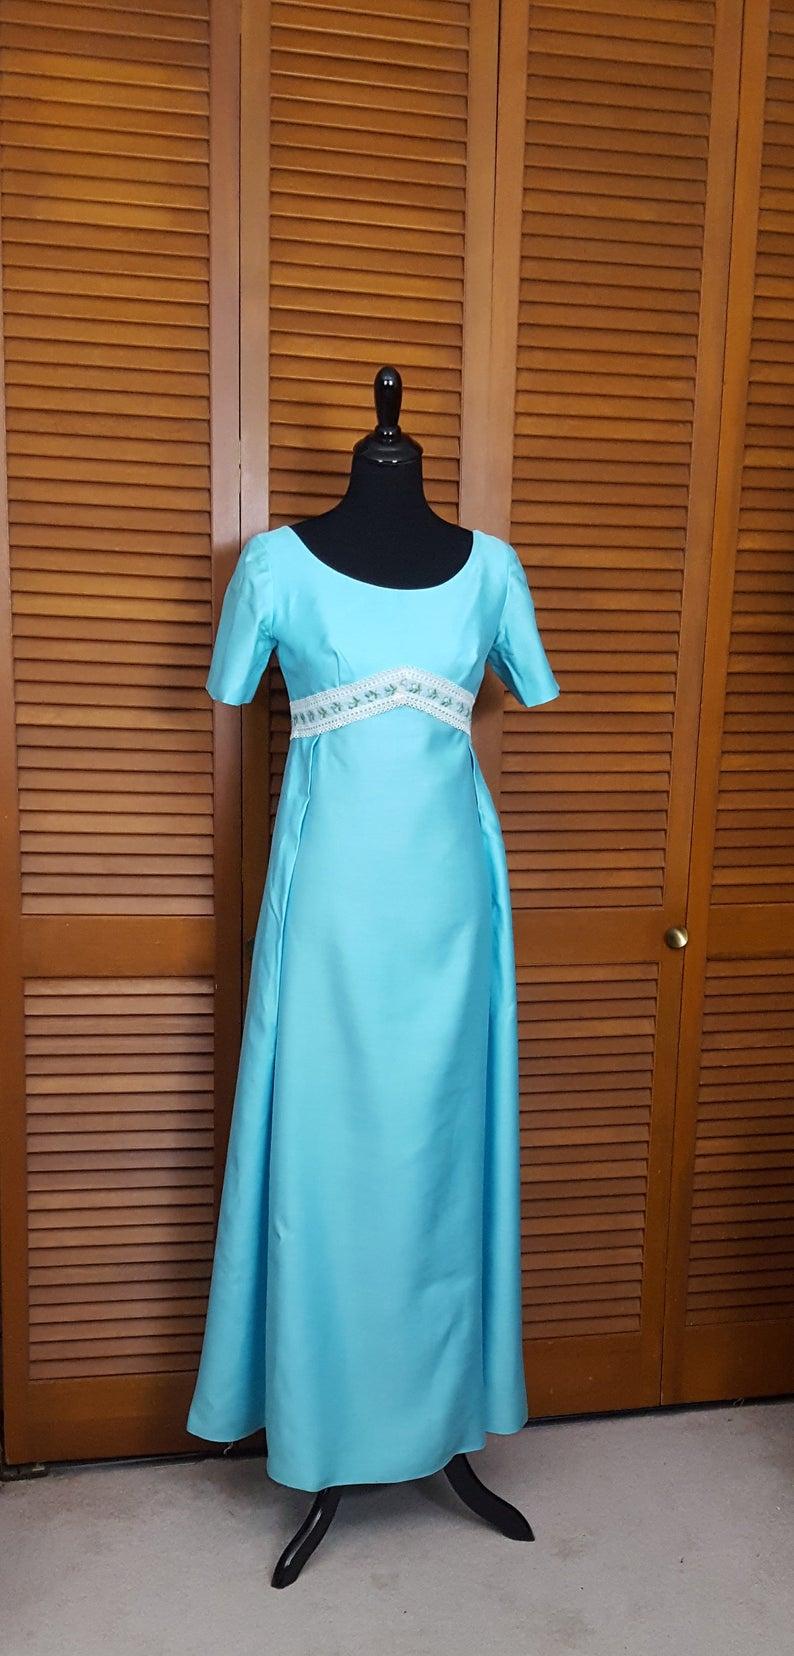 Vintage 1970s Sylvia Ann Bridesmaid Or Prom Dress Robin S Egg Blue Size Small 6 8 Dresses Blue Dress Formal Prom Dresses [ 1656 x 794 Pixel ]